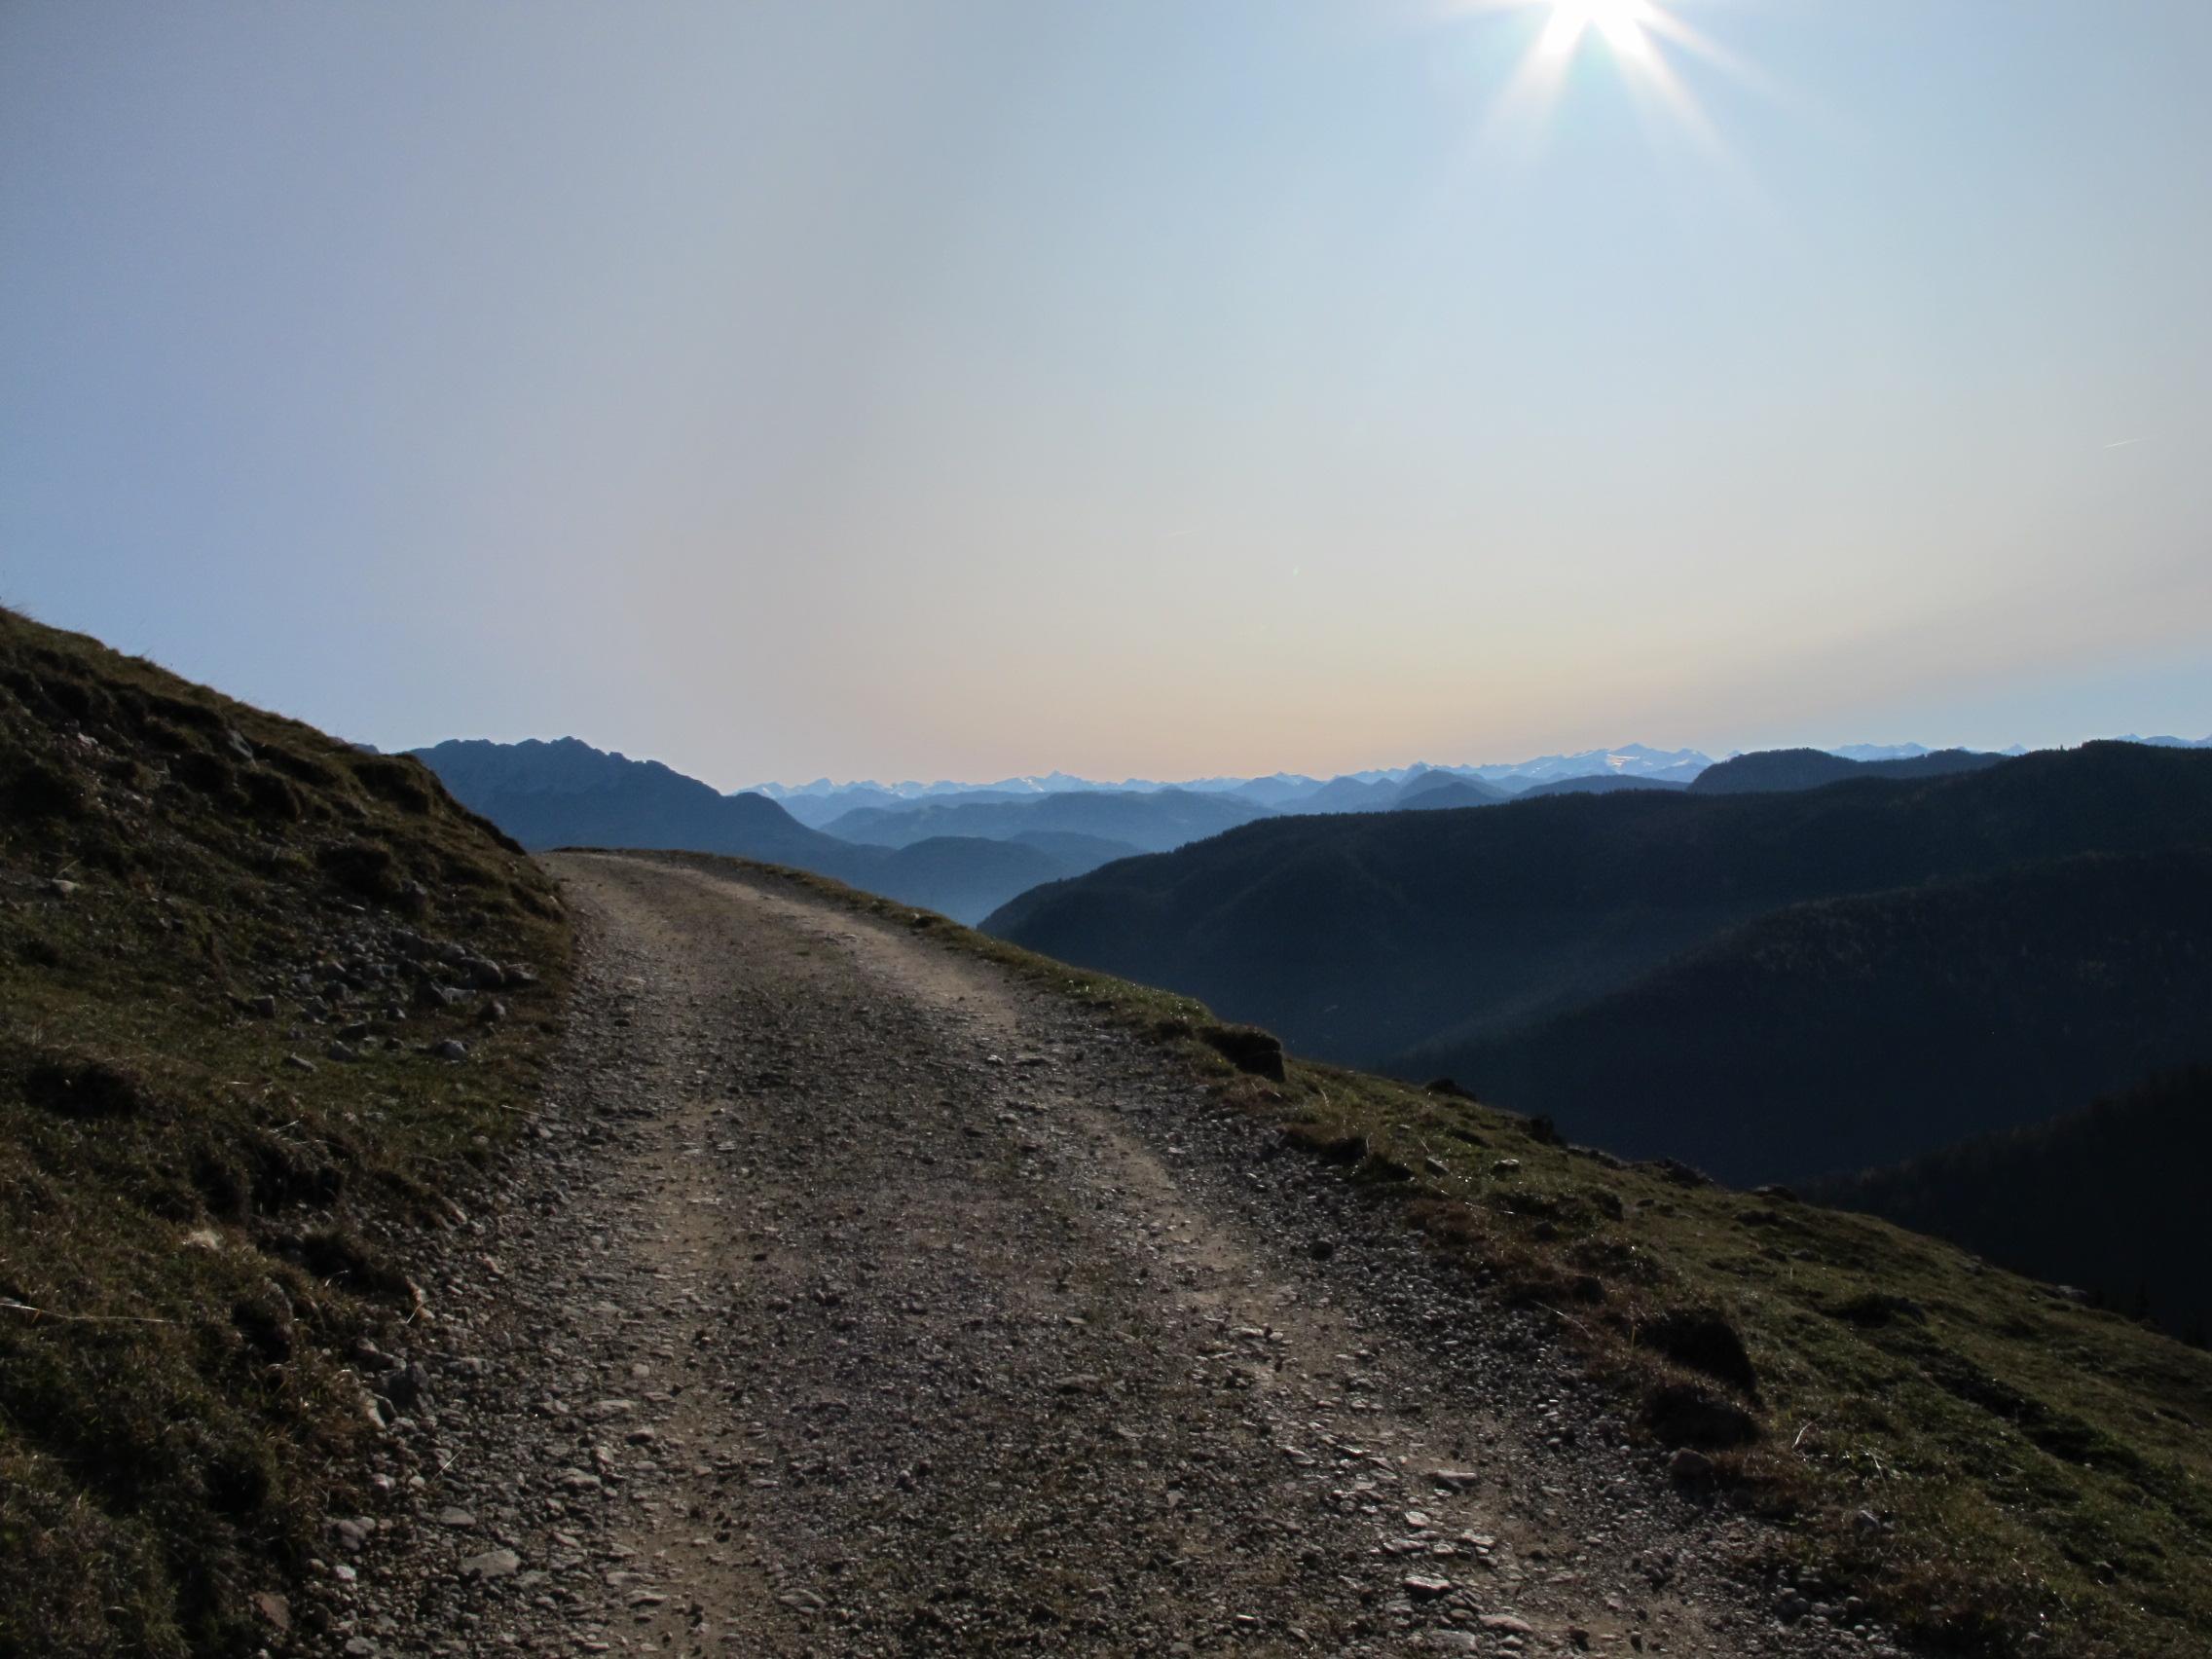 #hikingthelaps #wanderlust